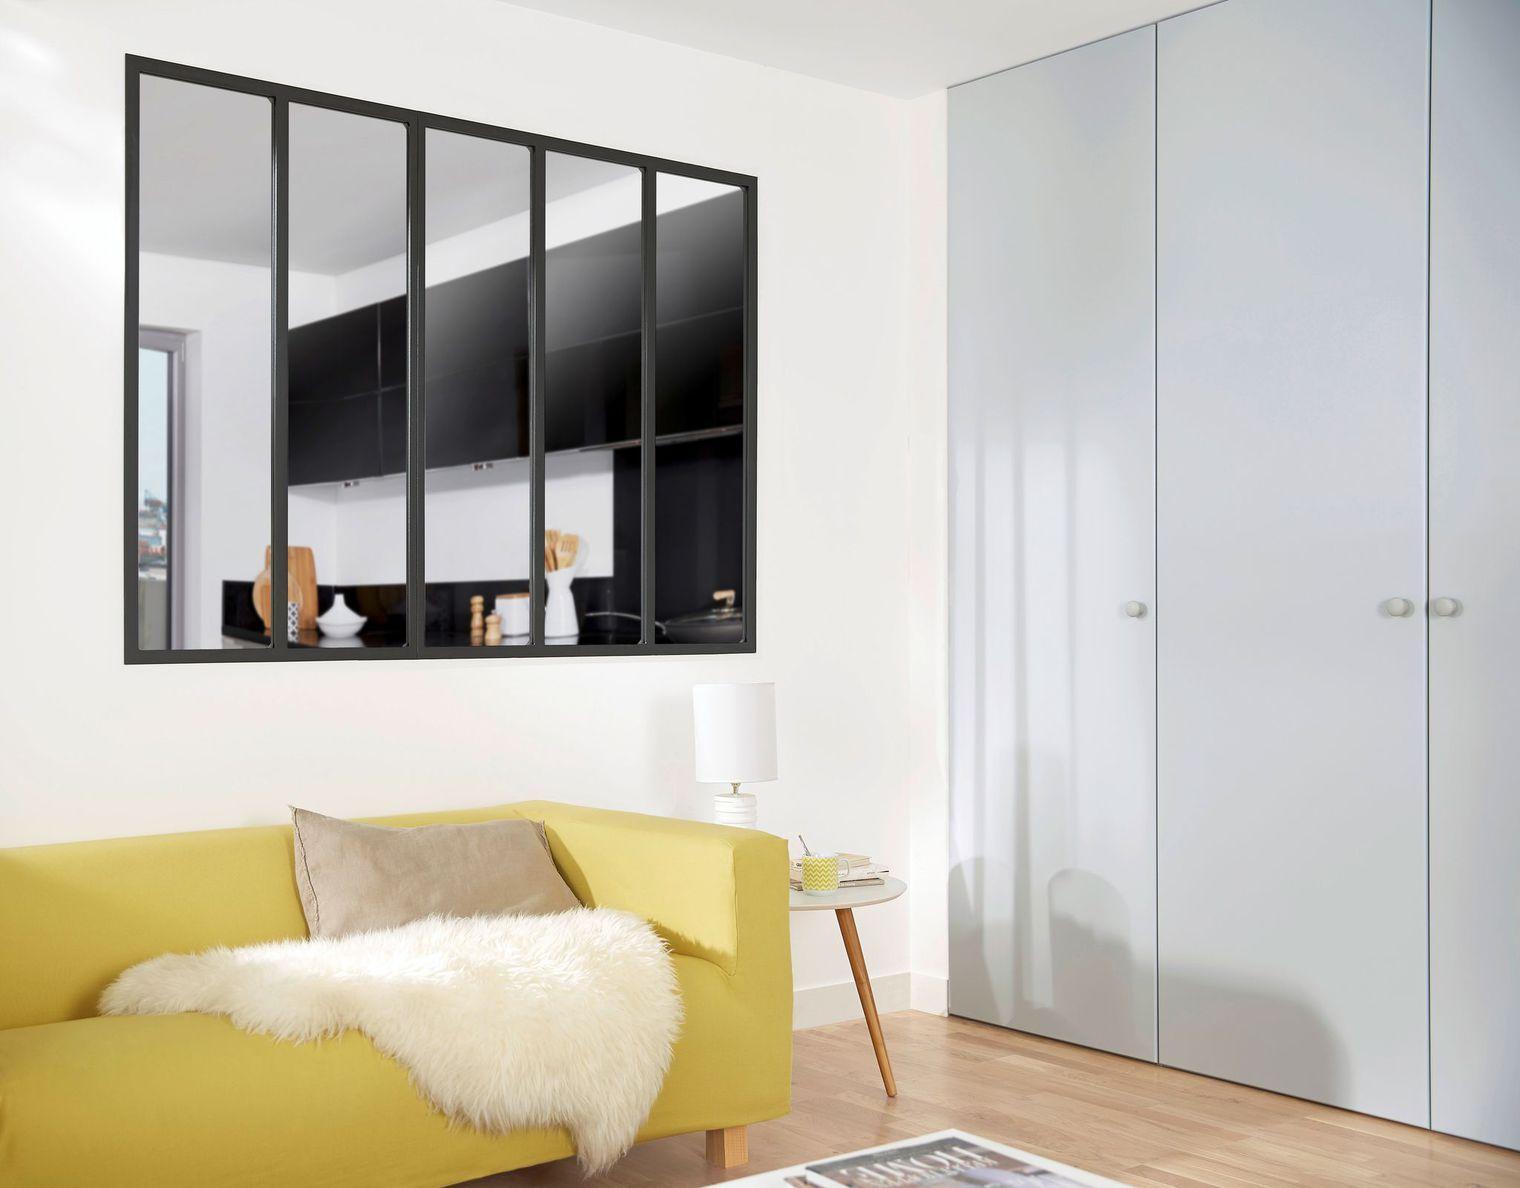 verri re int rieure conseils d 39 installation et erreurs viter verri re erreur et avec brio. Black Bedroom Furniture Sets. Home Design Ideas